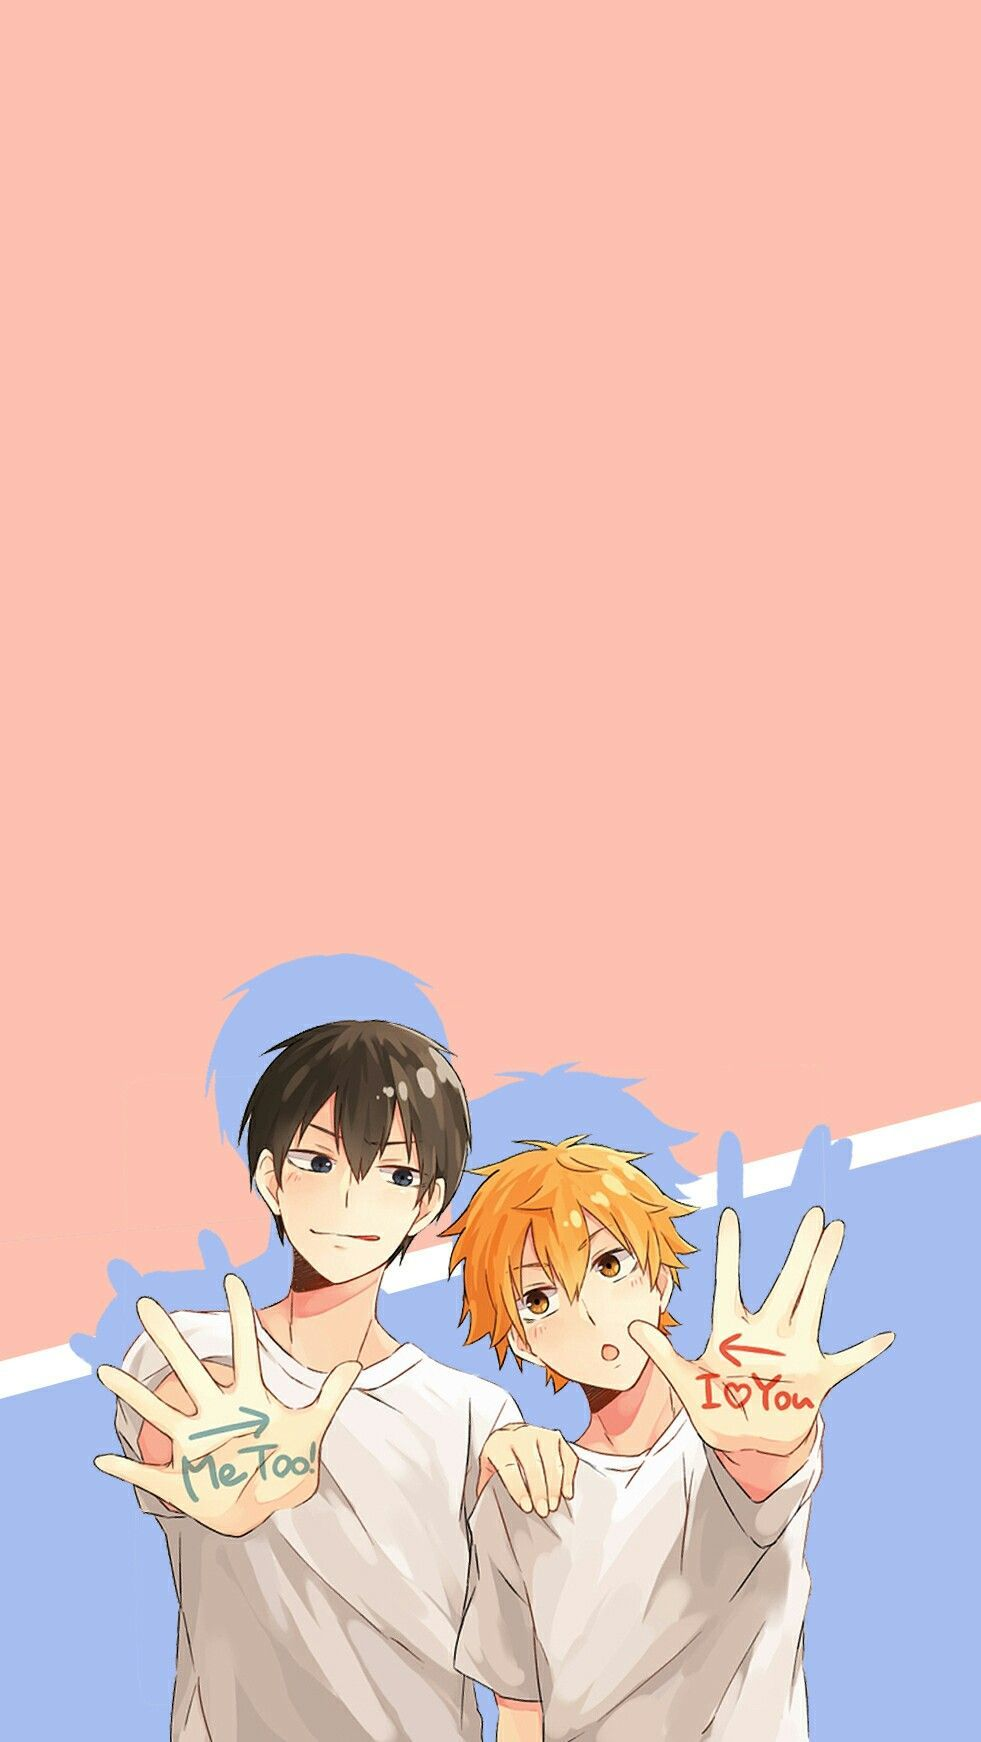 Anime Haikyuu Wallpapers Wallpaper Cave